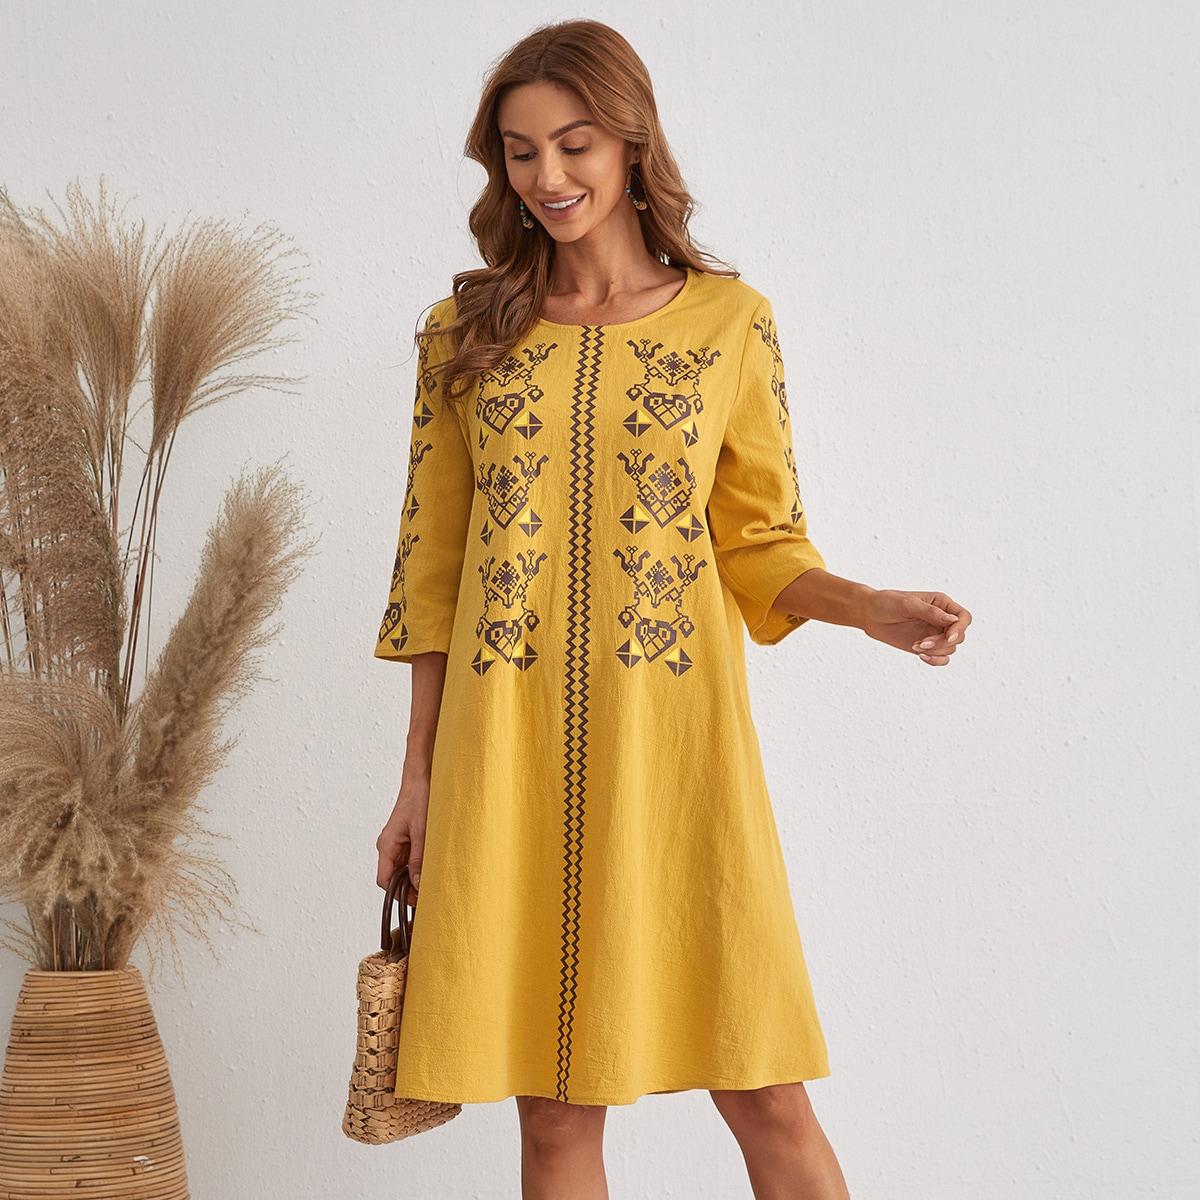 Tunika Kleid mit Geometrie Muster